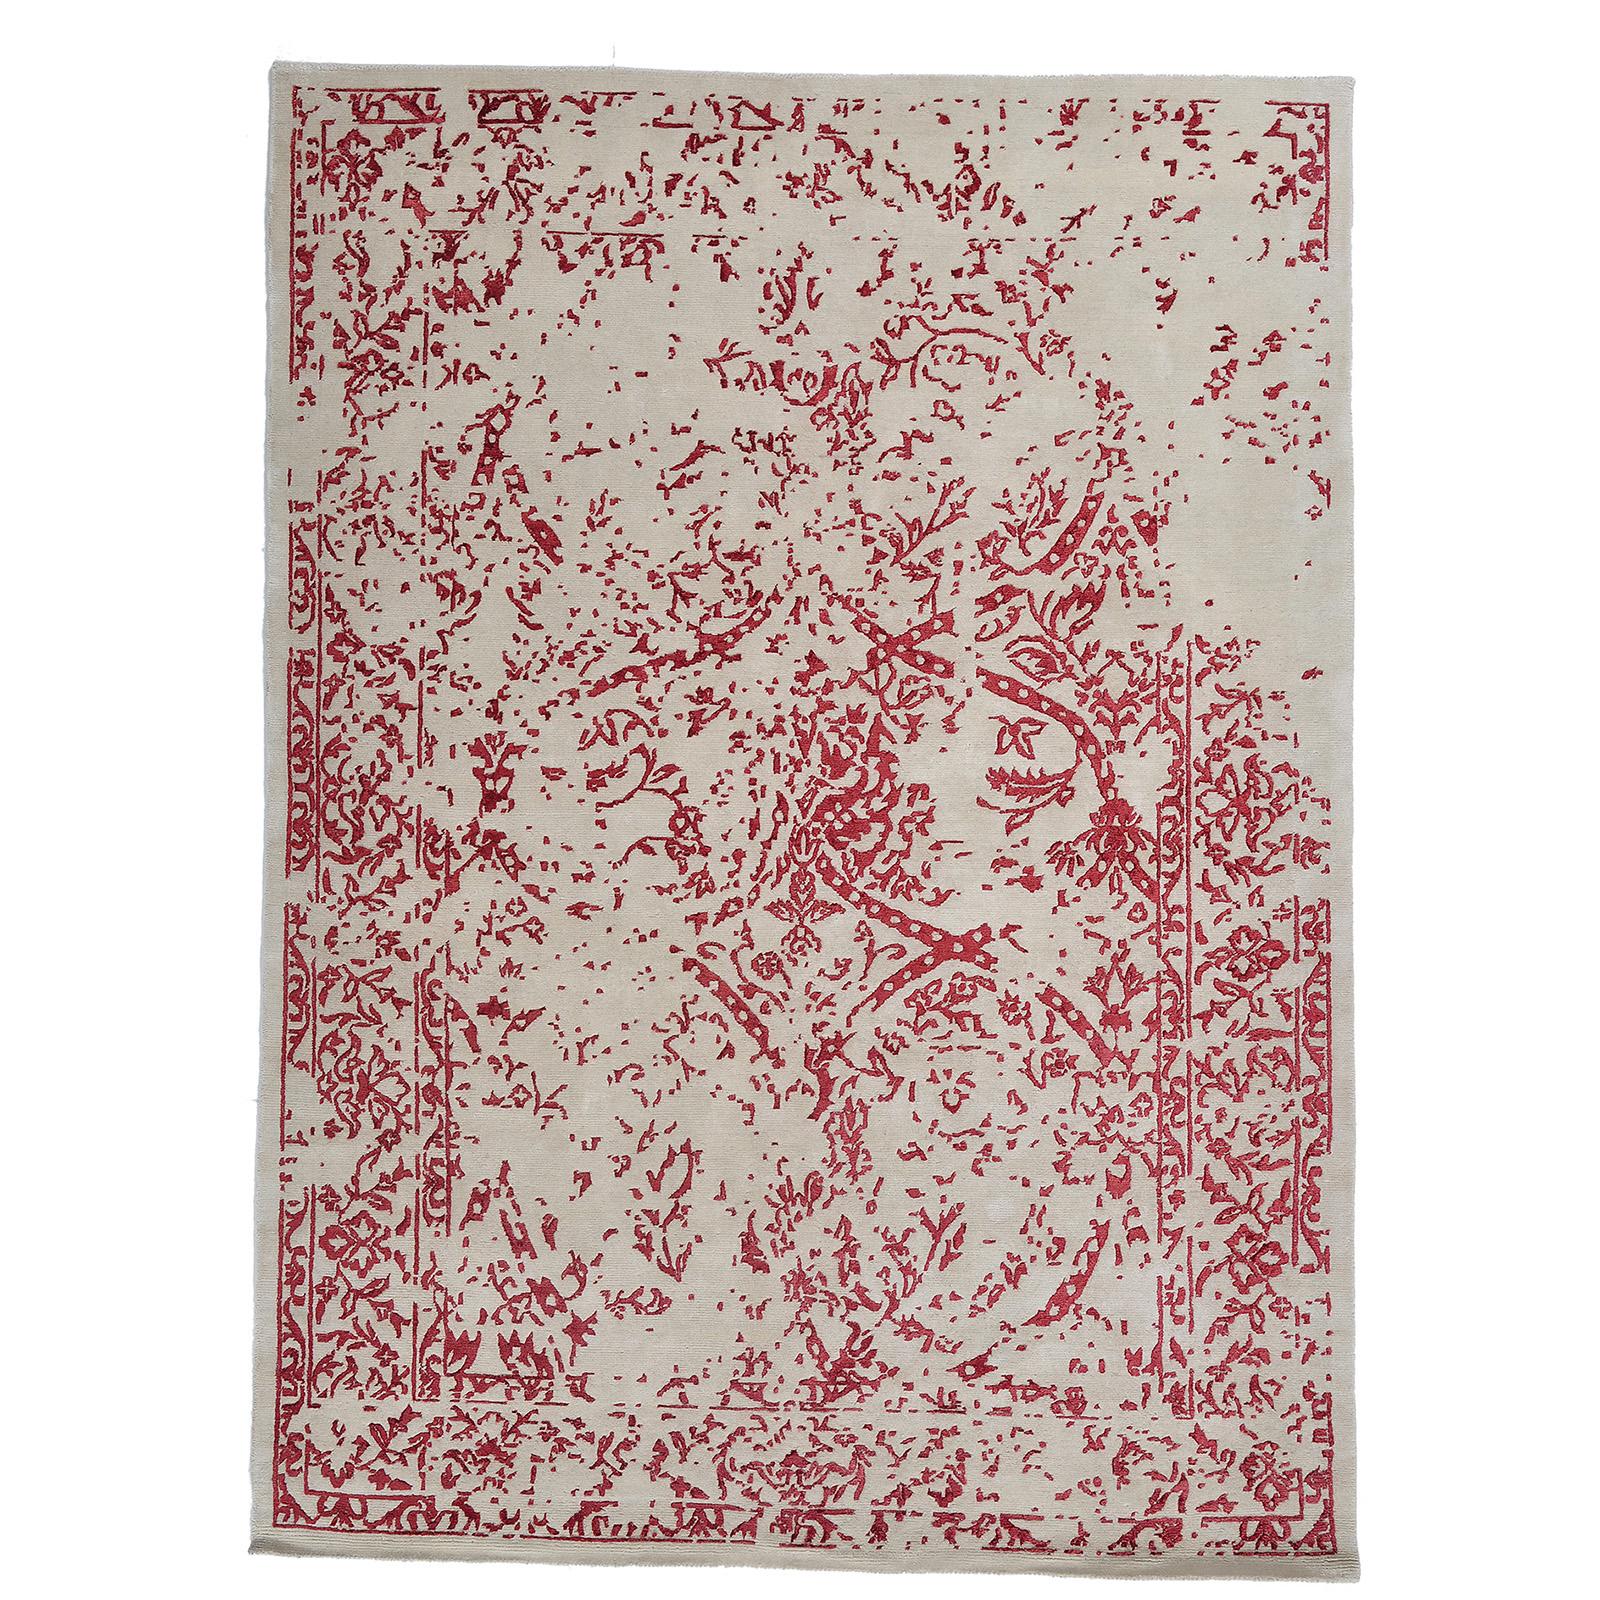 Damask (Stenros röd) matta storlek 240x170 cm